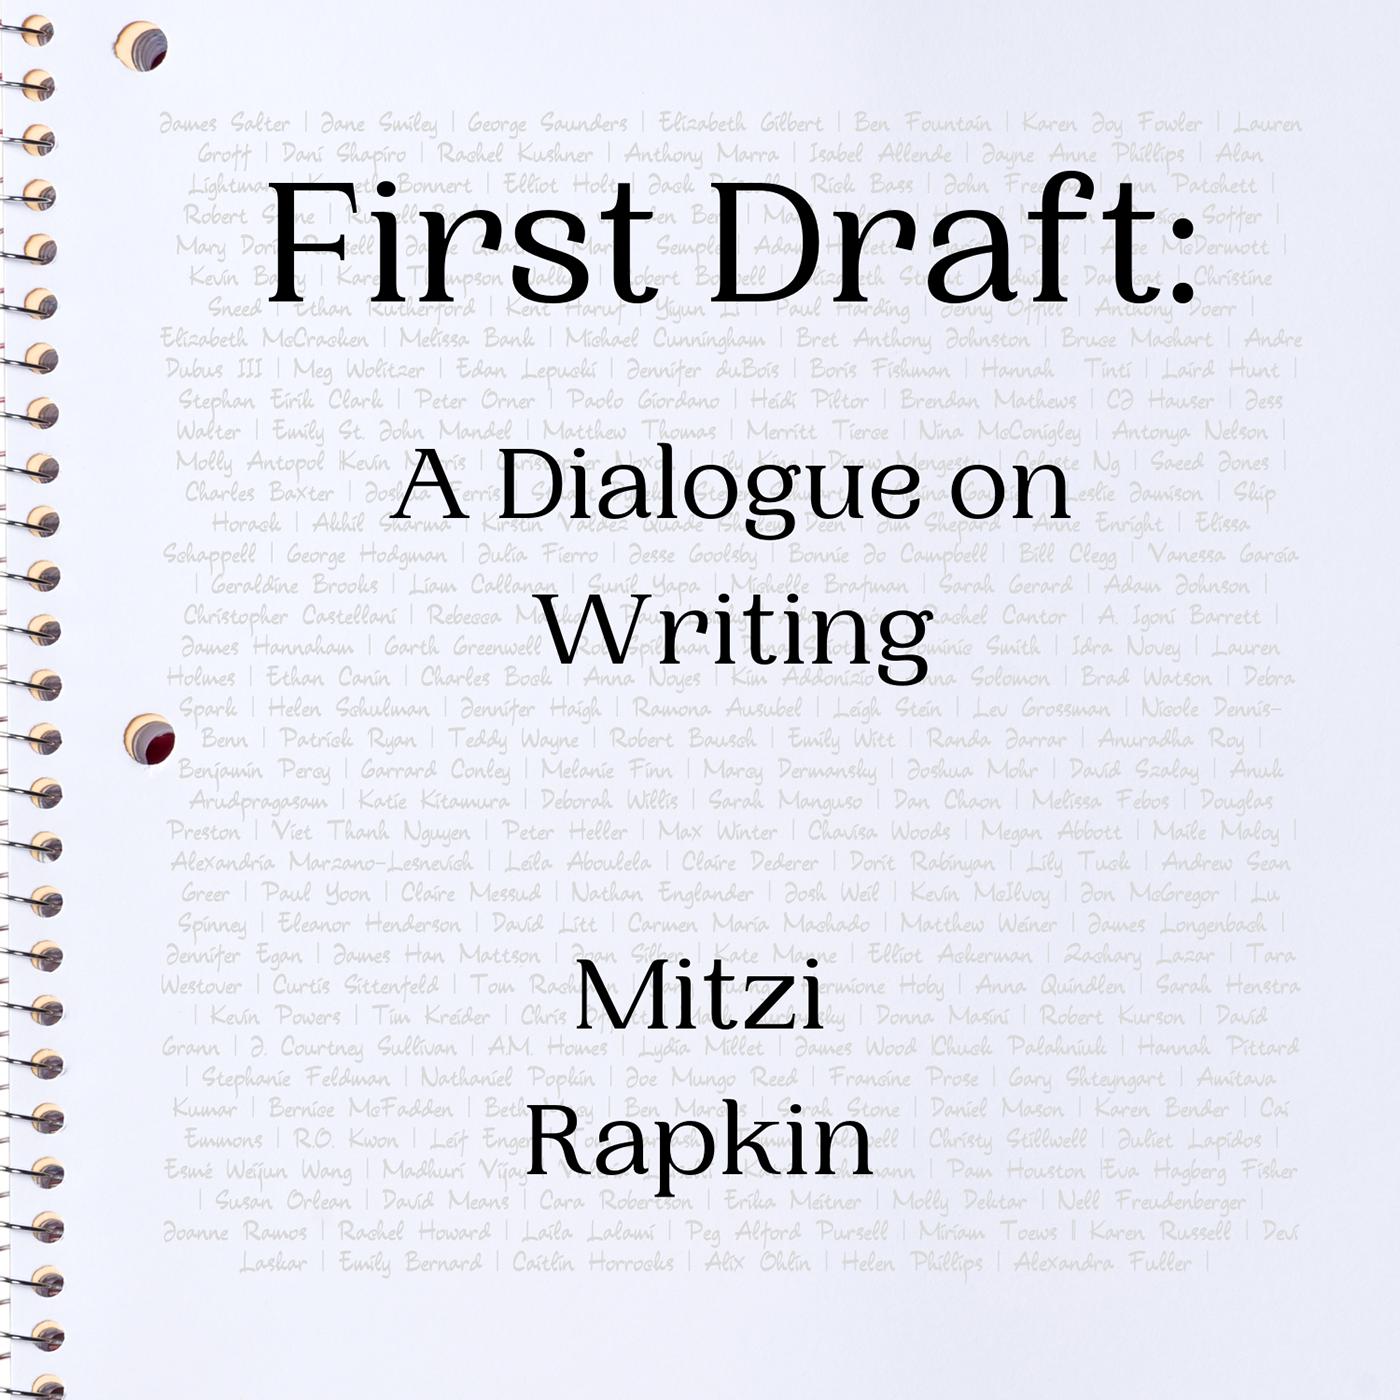 First Draft: A Dialogue on Writing show art